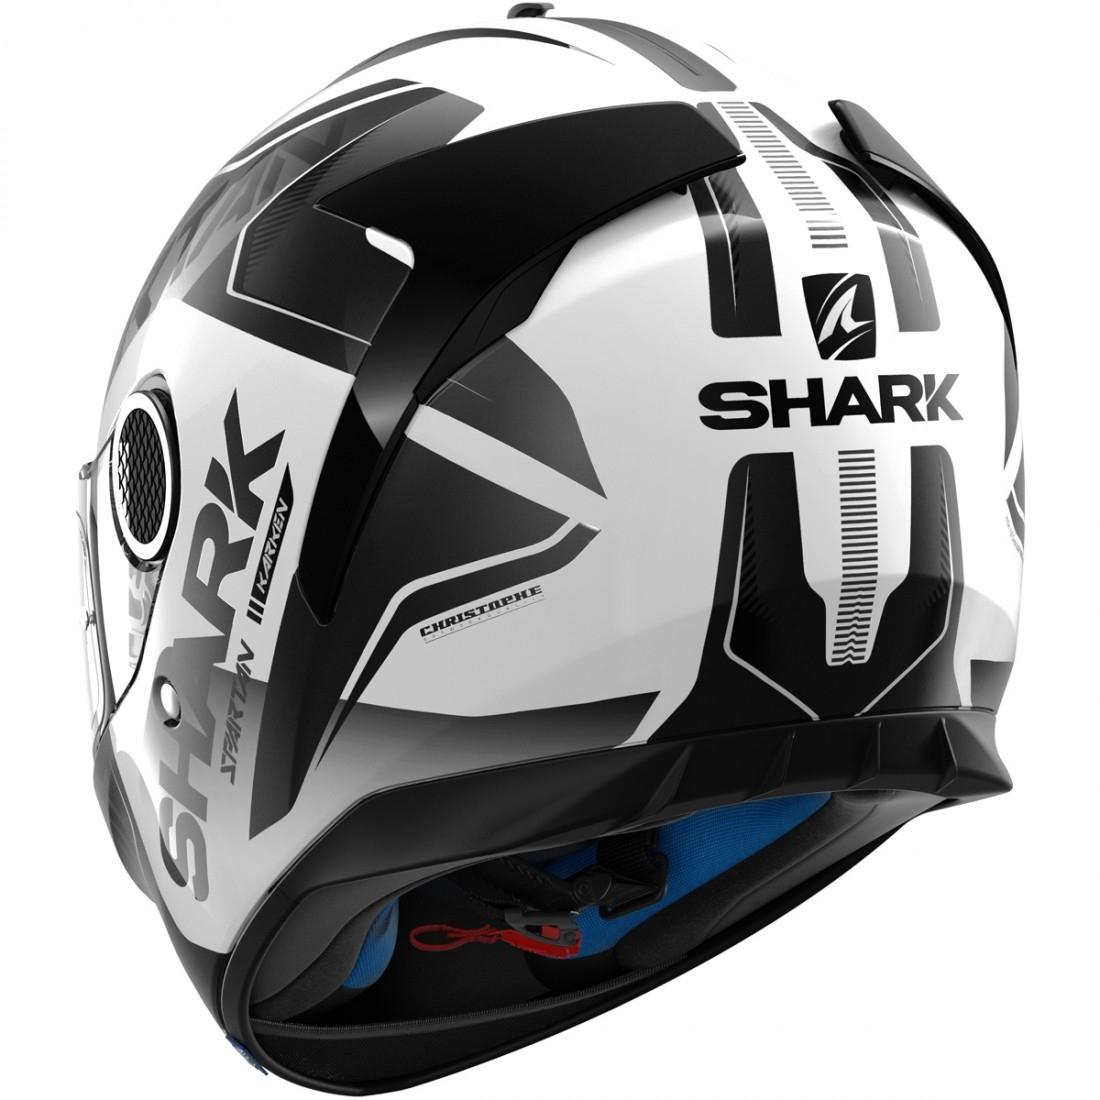 new shark helm spartan karken wei gr l 59 60. Black Bedroom Furniture Sets. Home Design Ideas